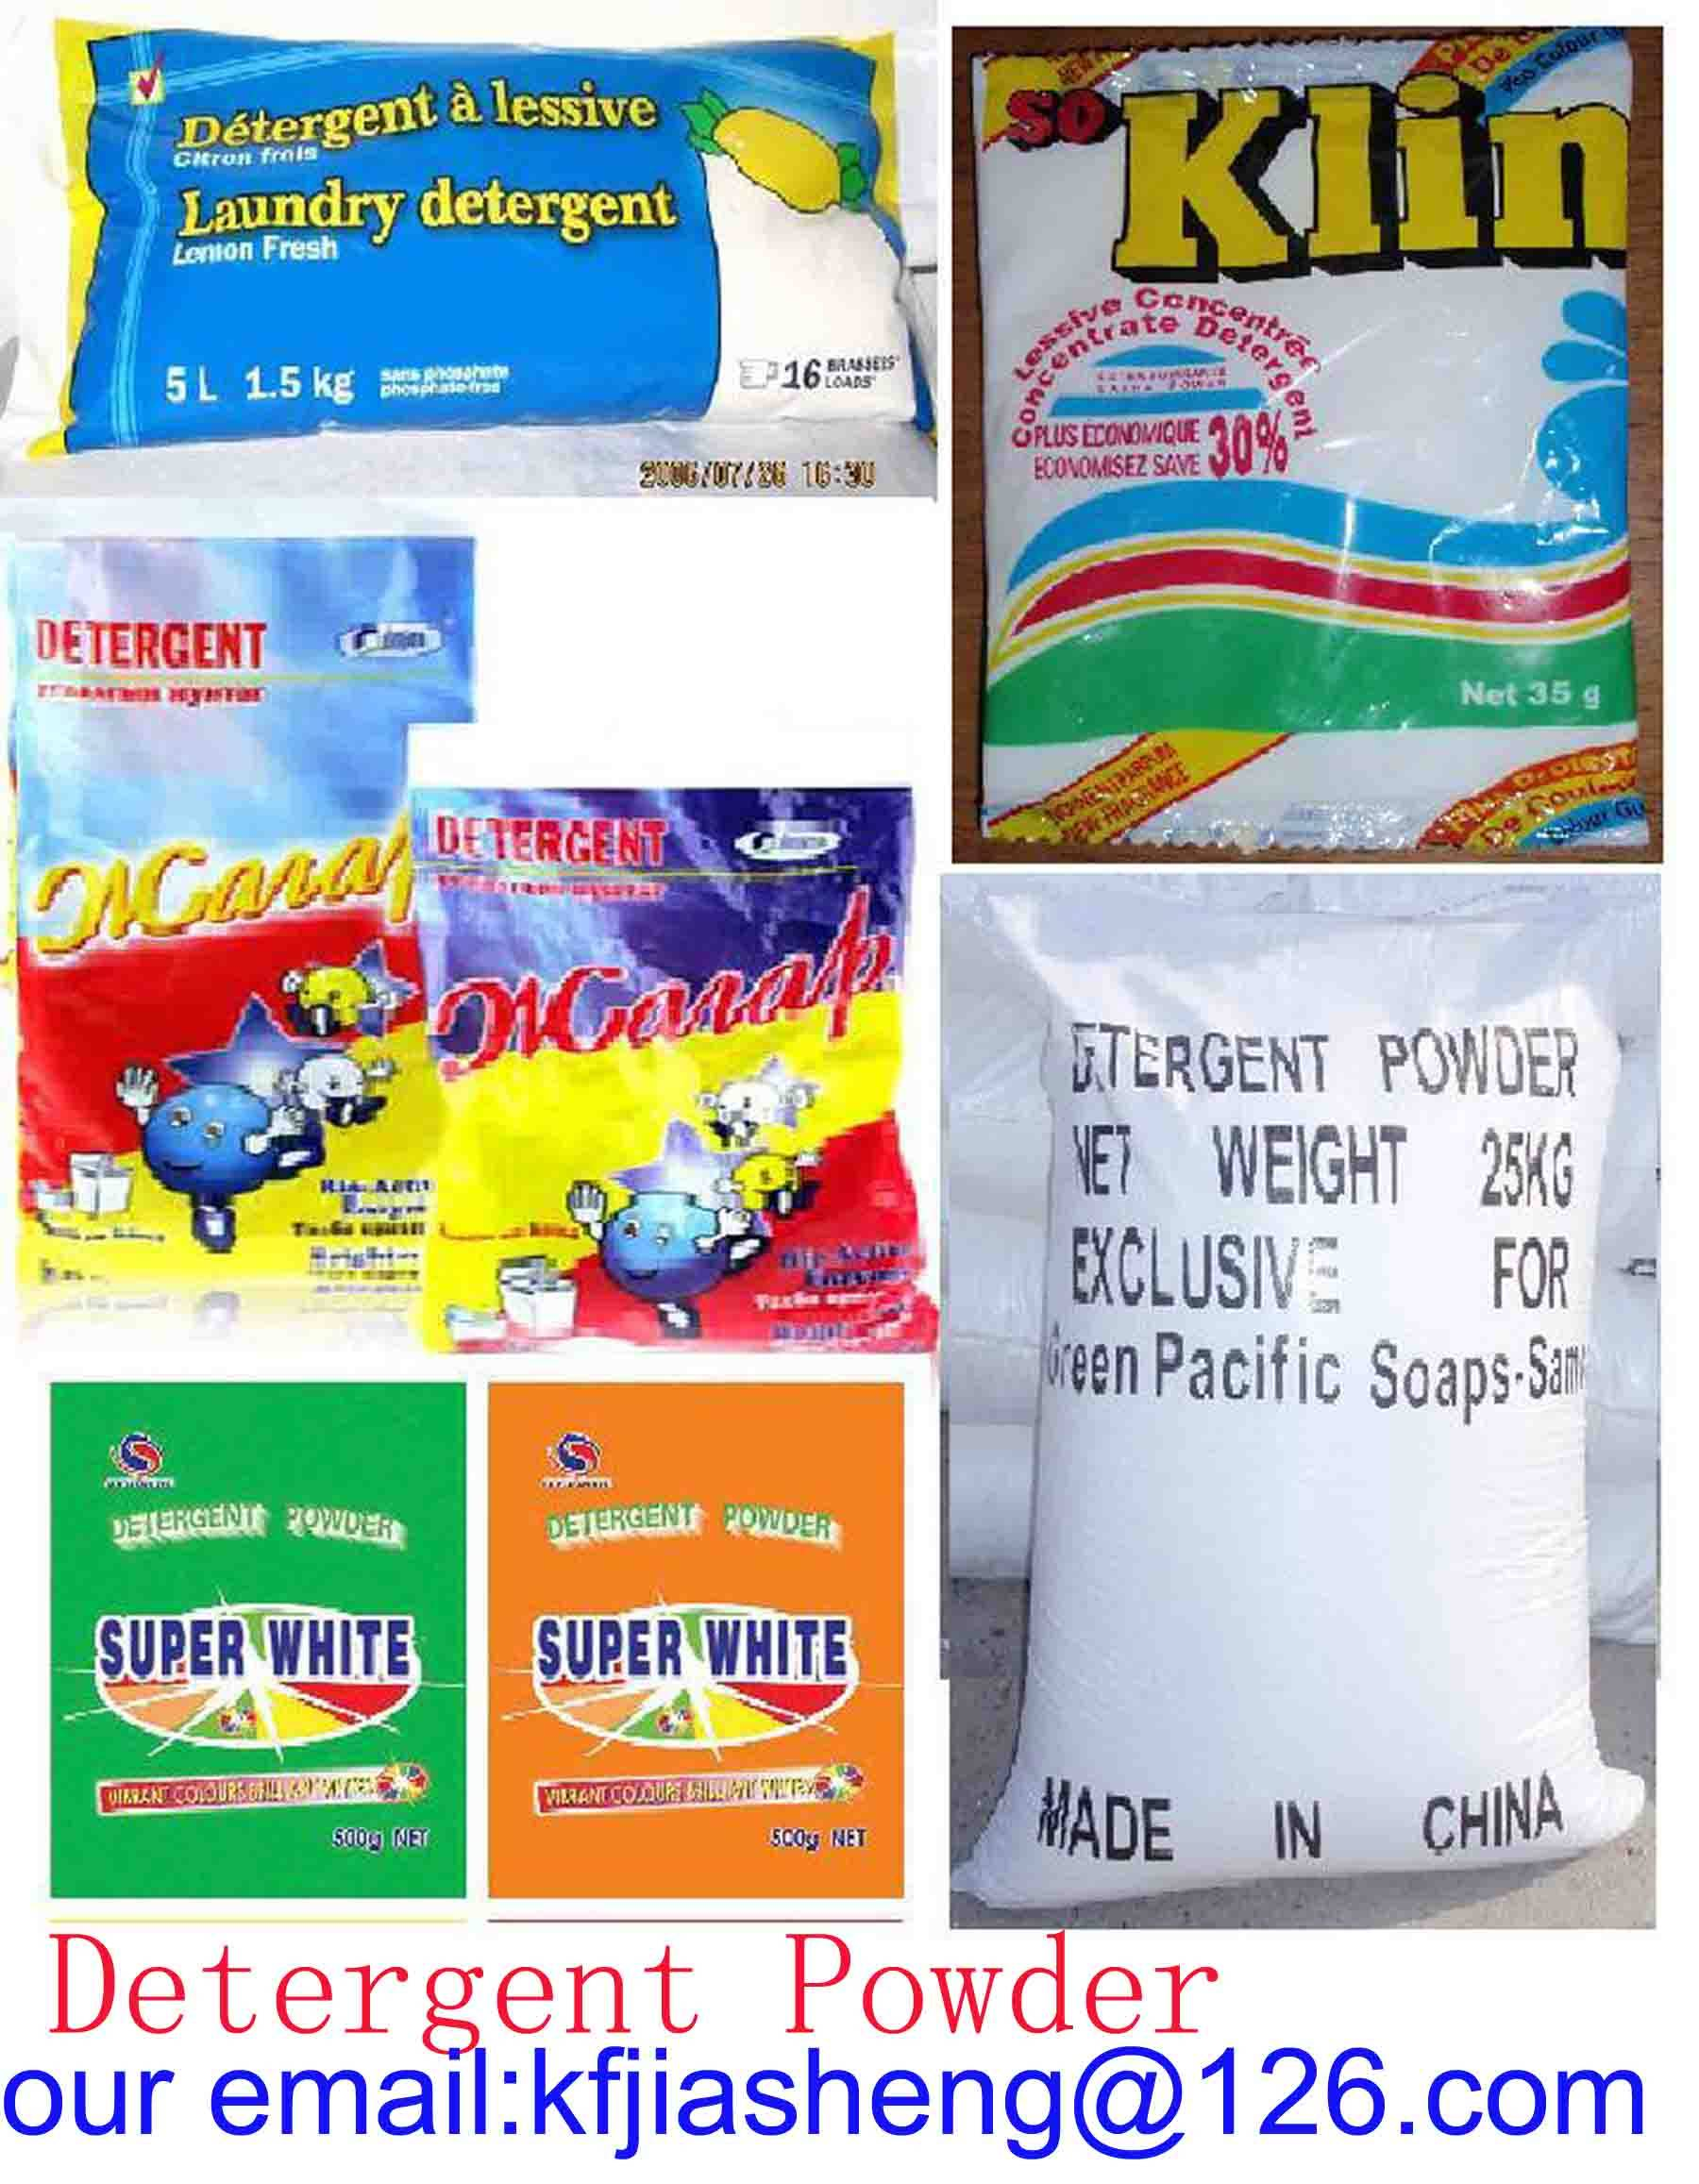 Detergent Powder / Washing Powder / Laundry Powder(our email:kfjiasheng(at)126.com)